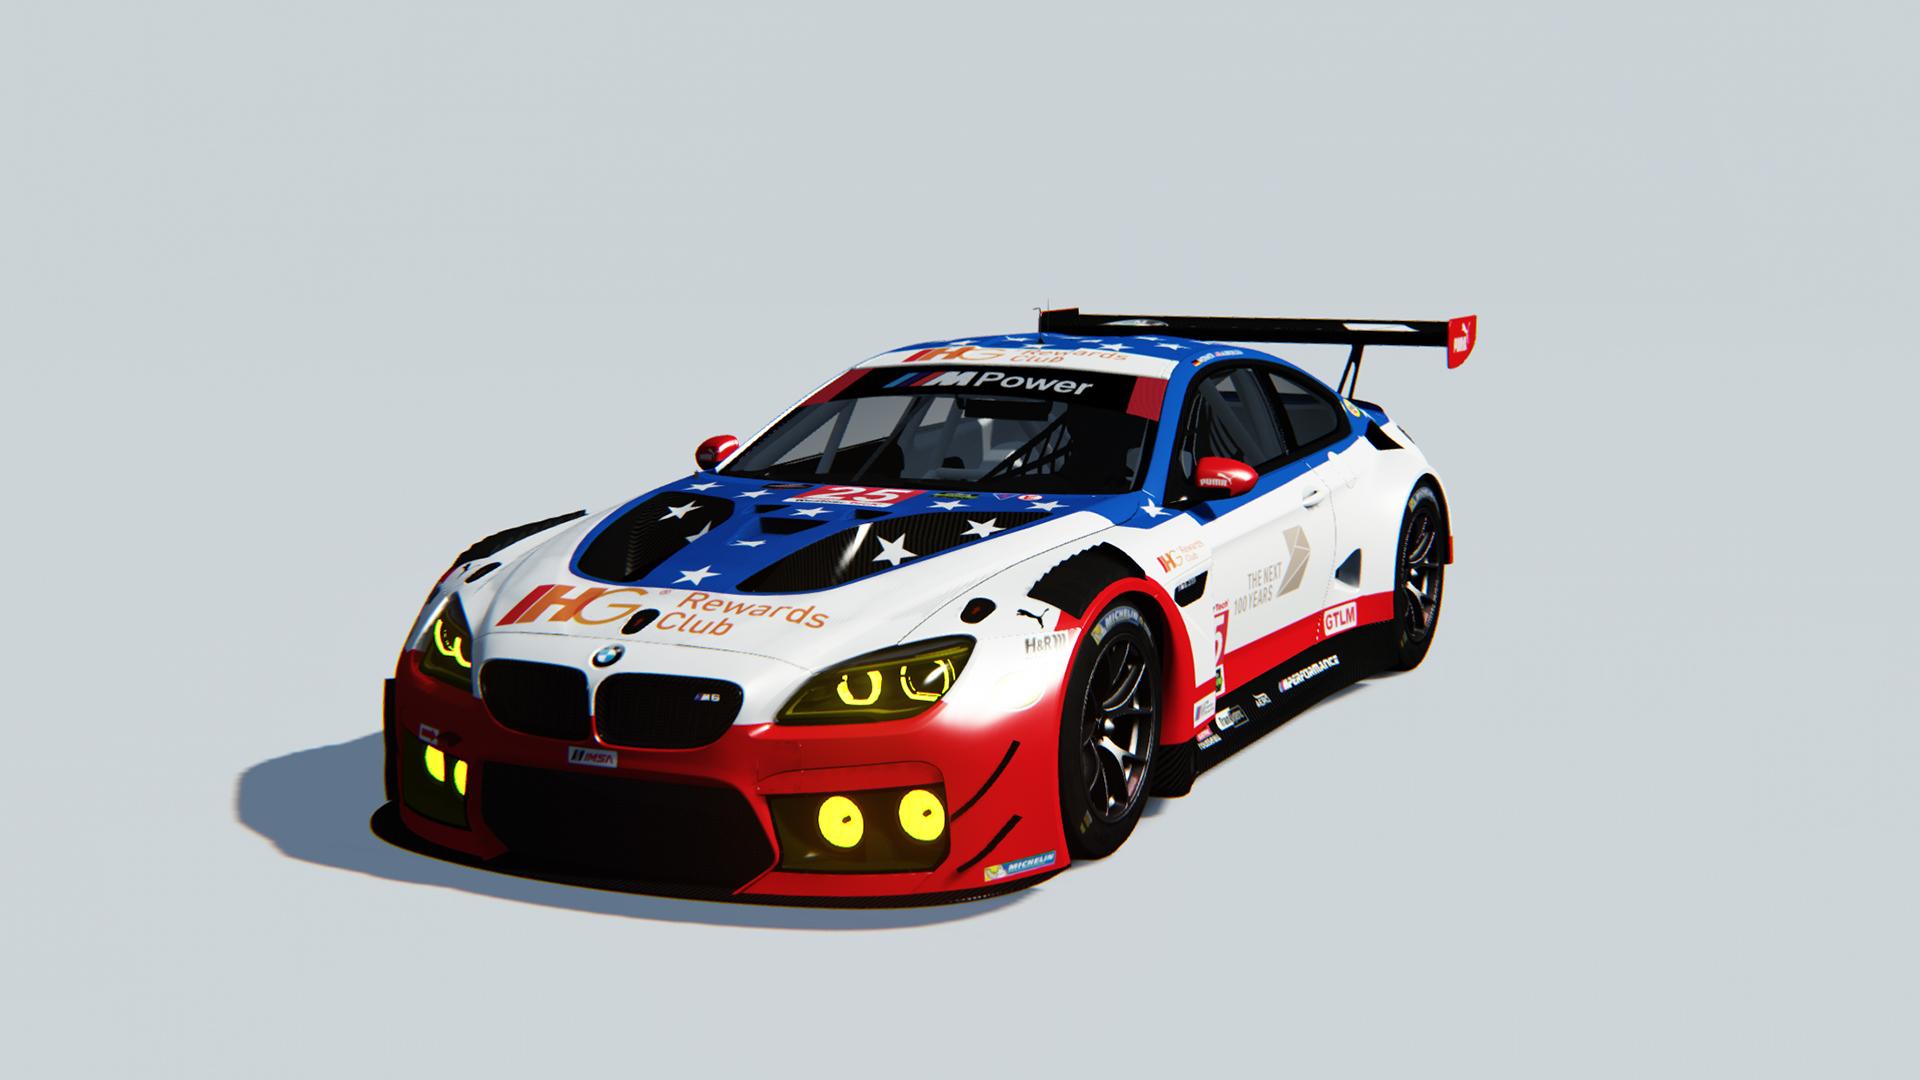 BMW_Livrea_3.jpg